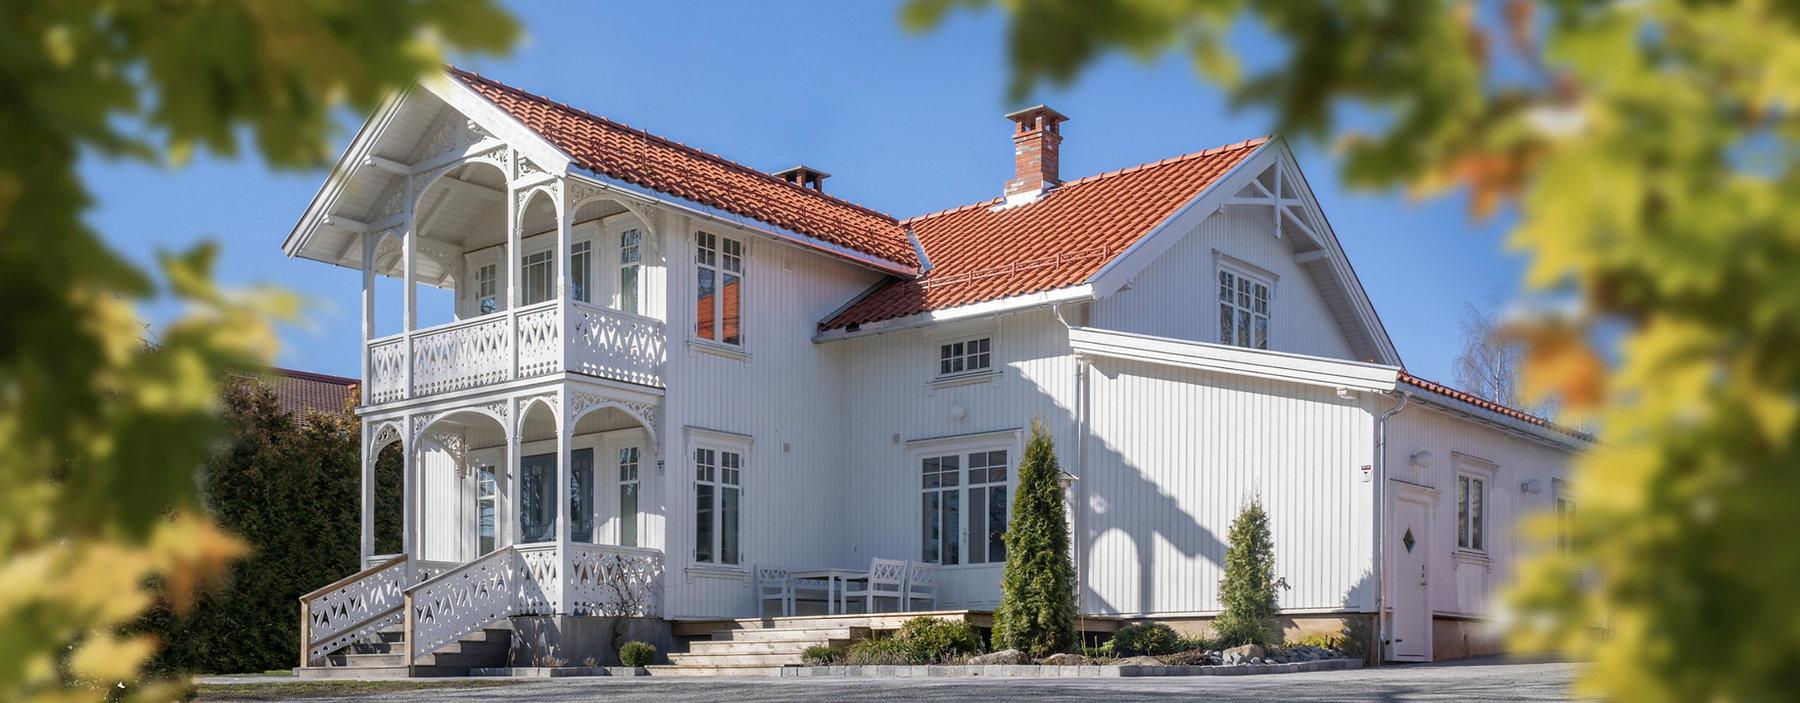 Hus i sveitser stil, detaljer fra Faktortre snekkerverksted